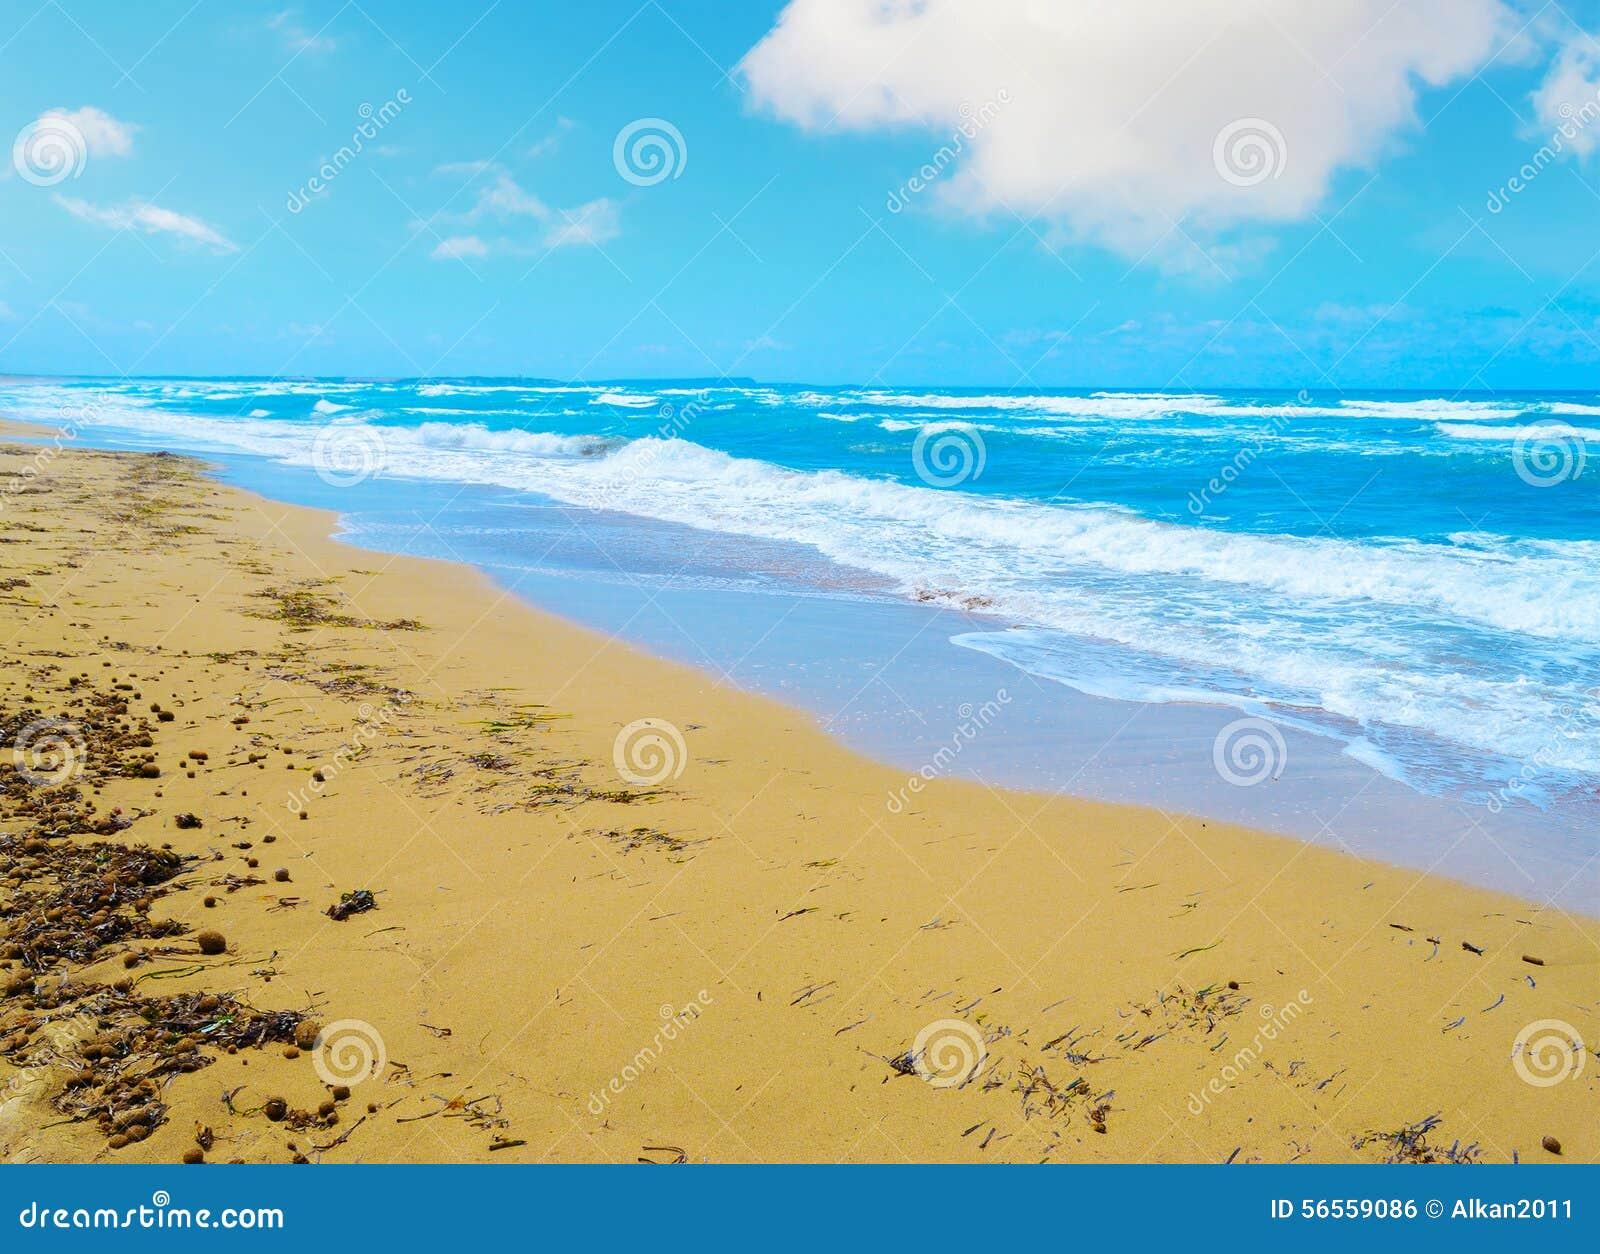 Download Κίτρινη και μπλε ακτή στη Σαρδηνία Στοκ Εικόνες - εικόνα από ειρήνη, θέρετρο: 56559086